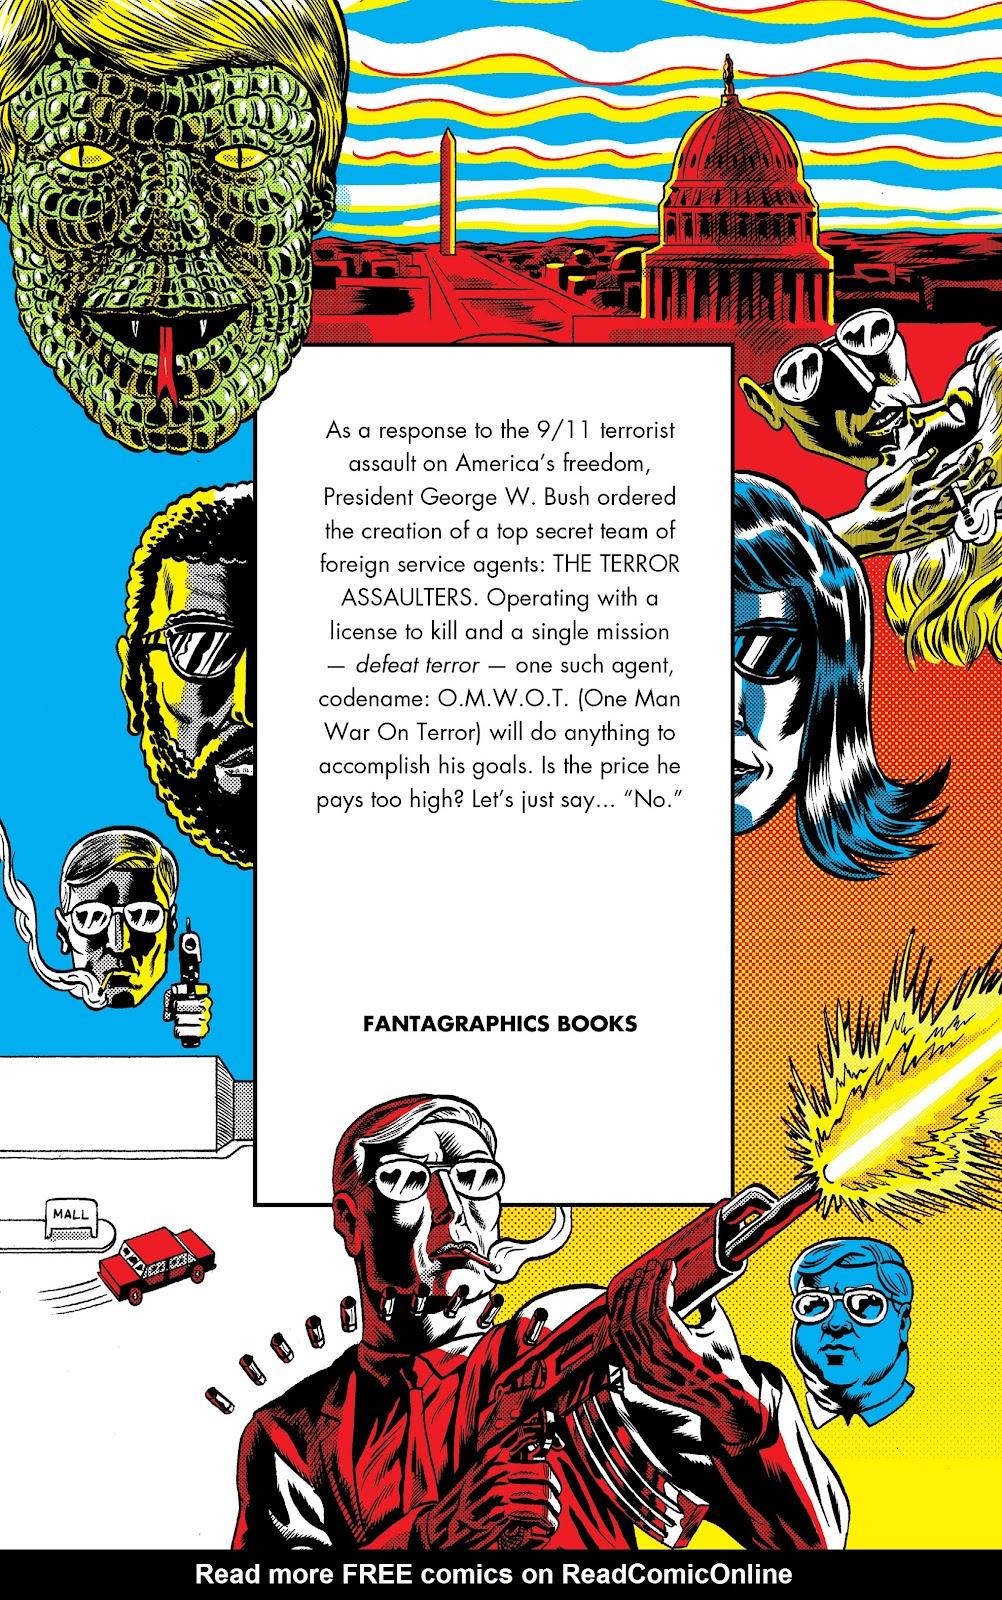 Read online Terror Assaulter: O.M.W.O.T (One Man War On Terror) comic -  Issue # TPB - 2